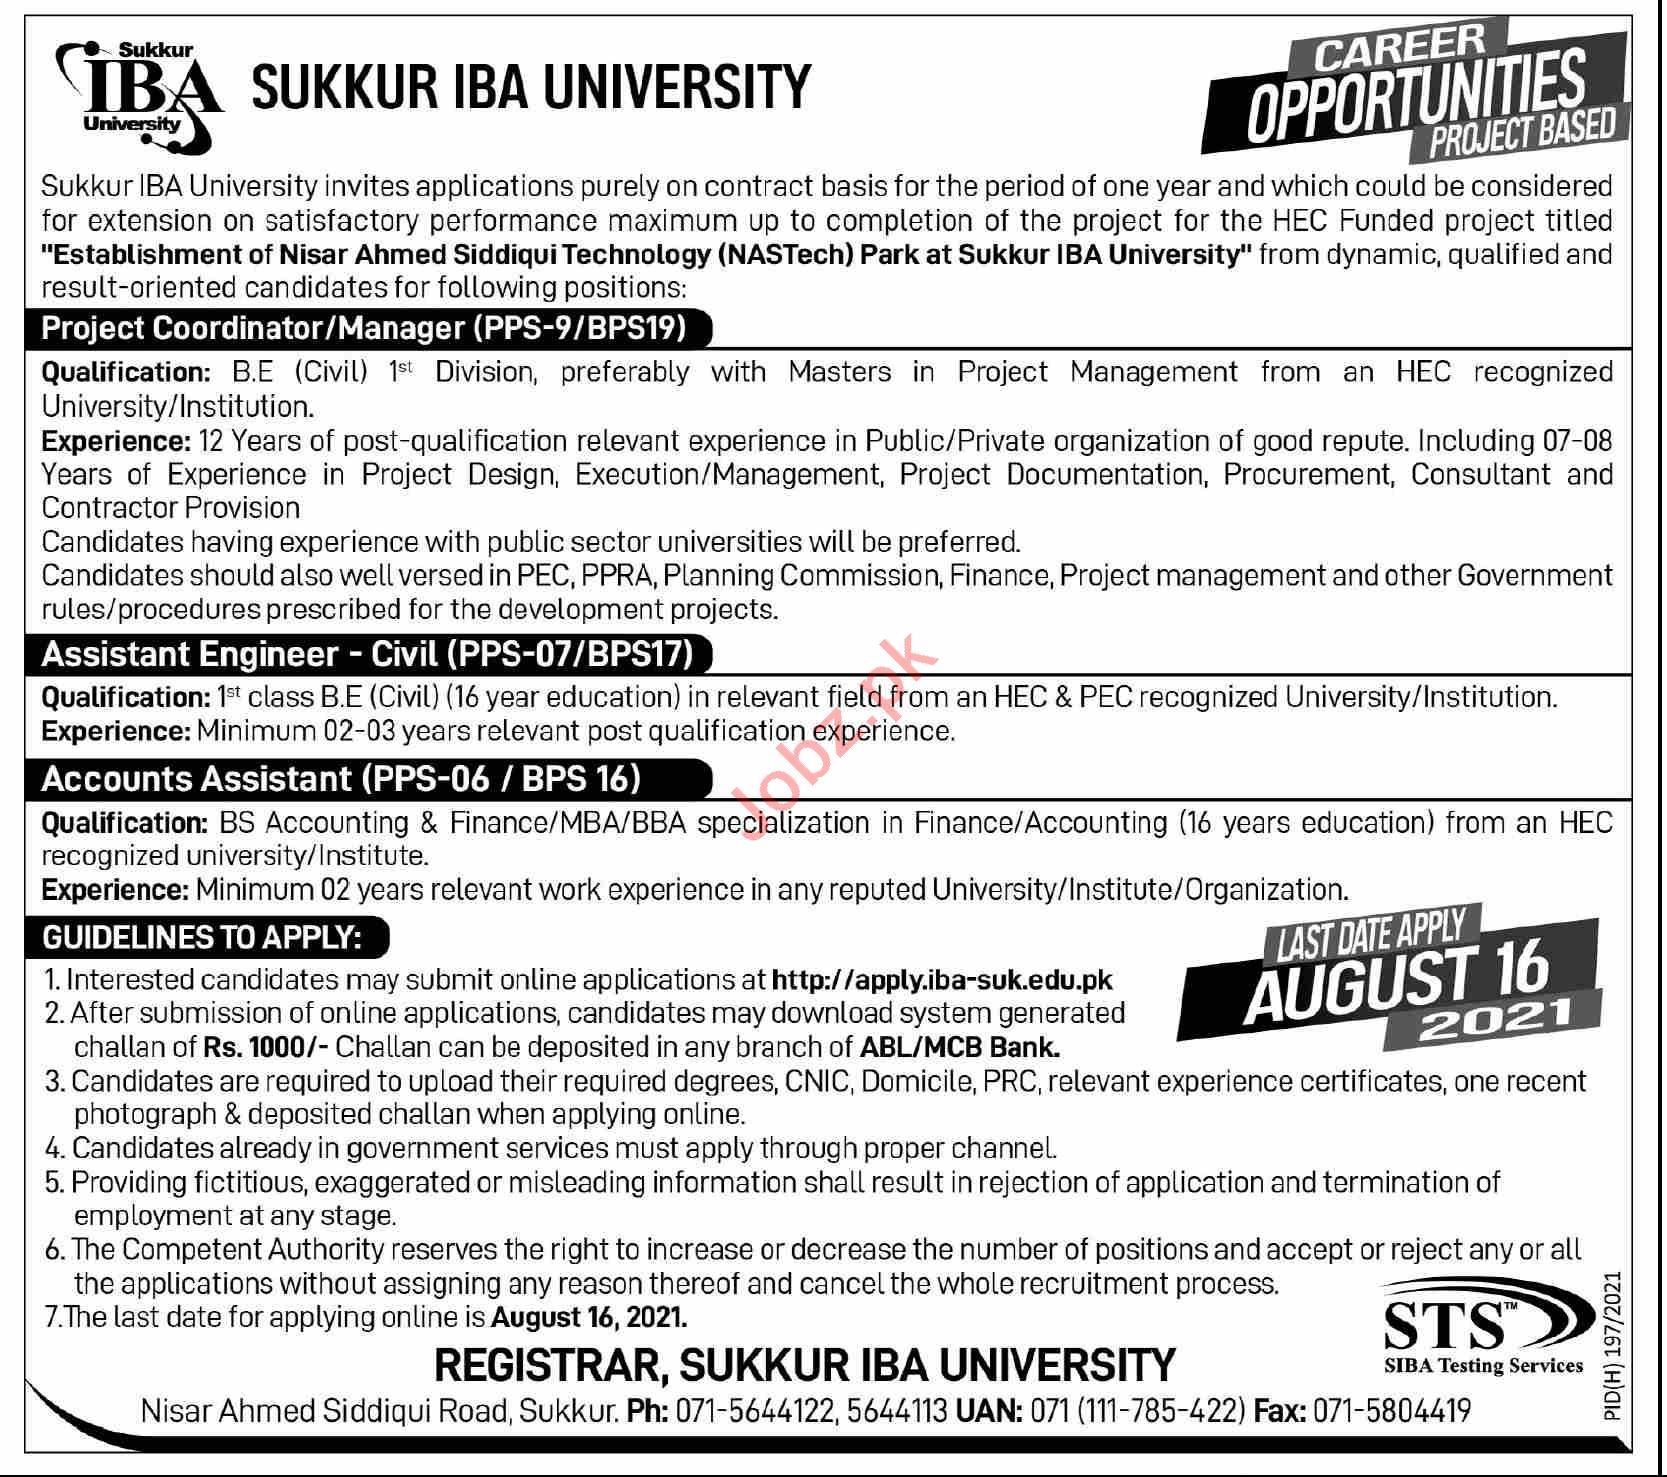 Sukkur IBA University Jobs 2021 for Project Coordinator